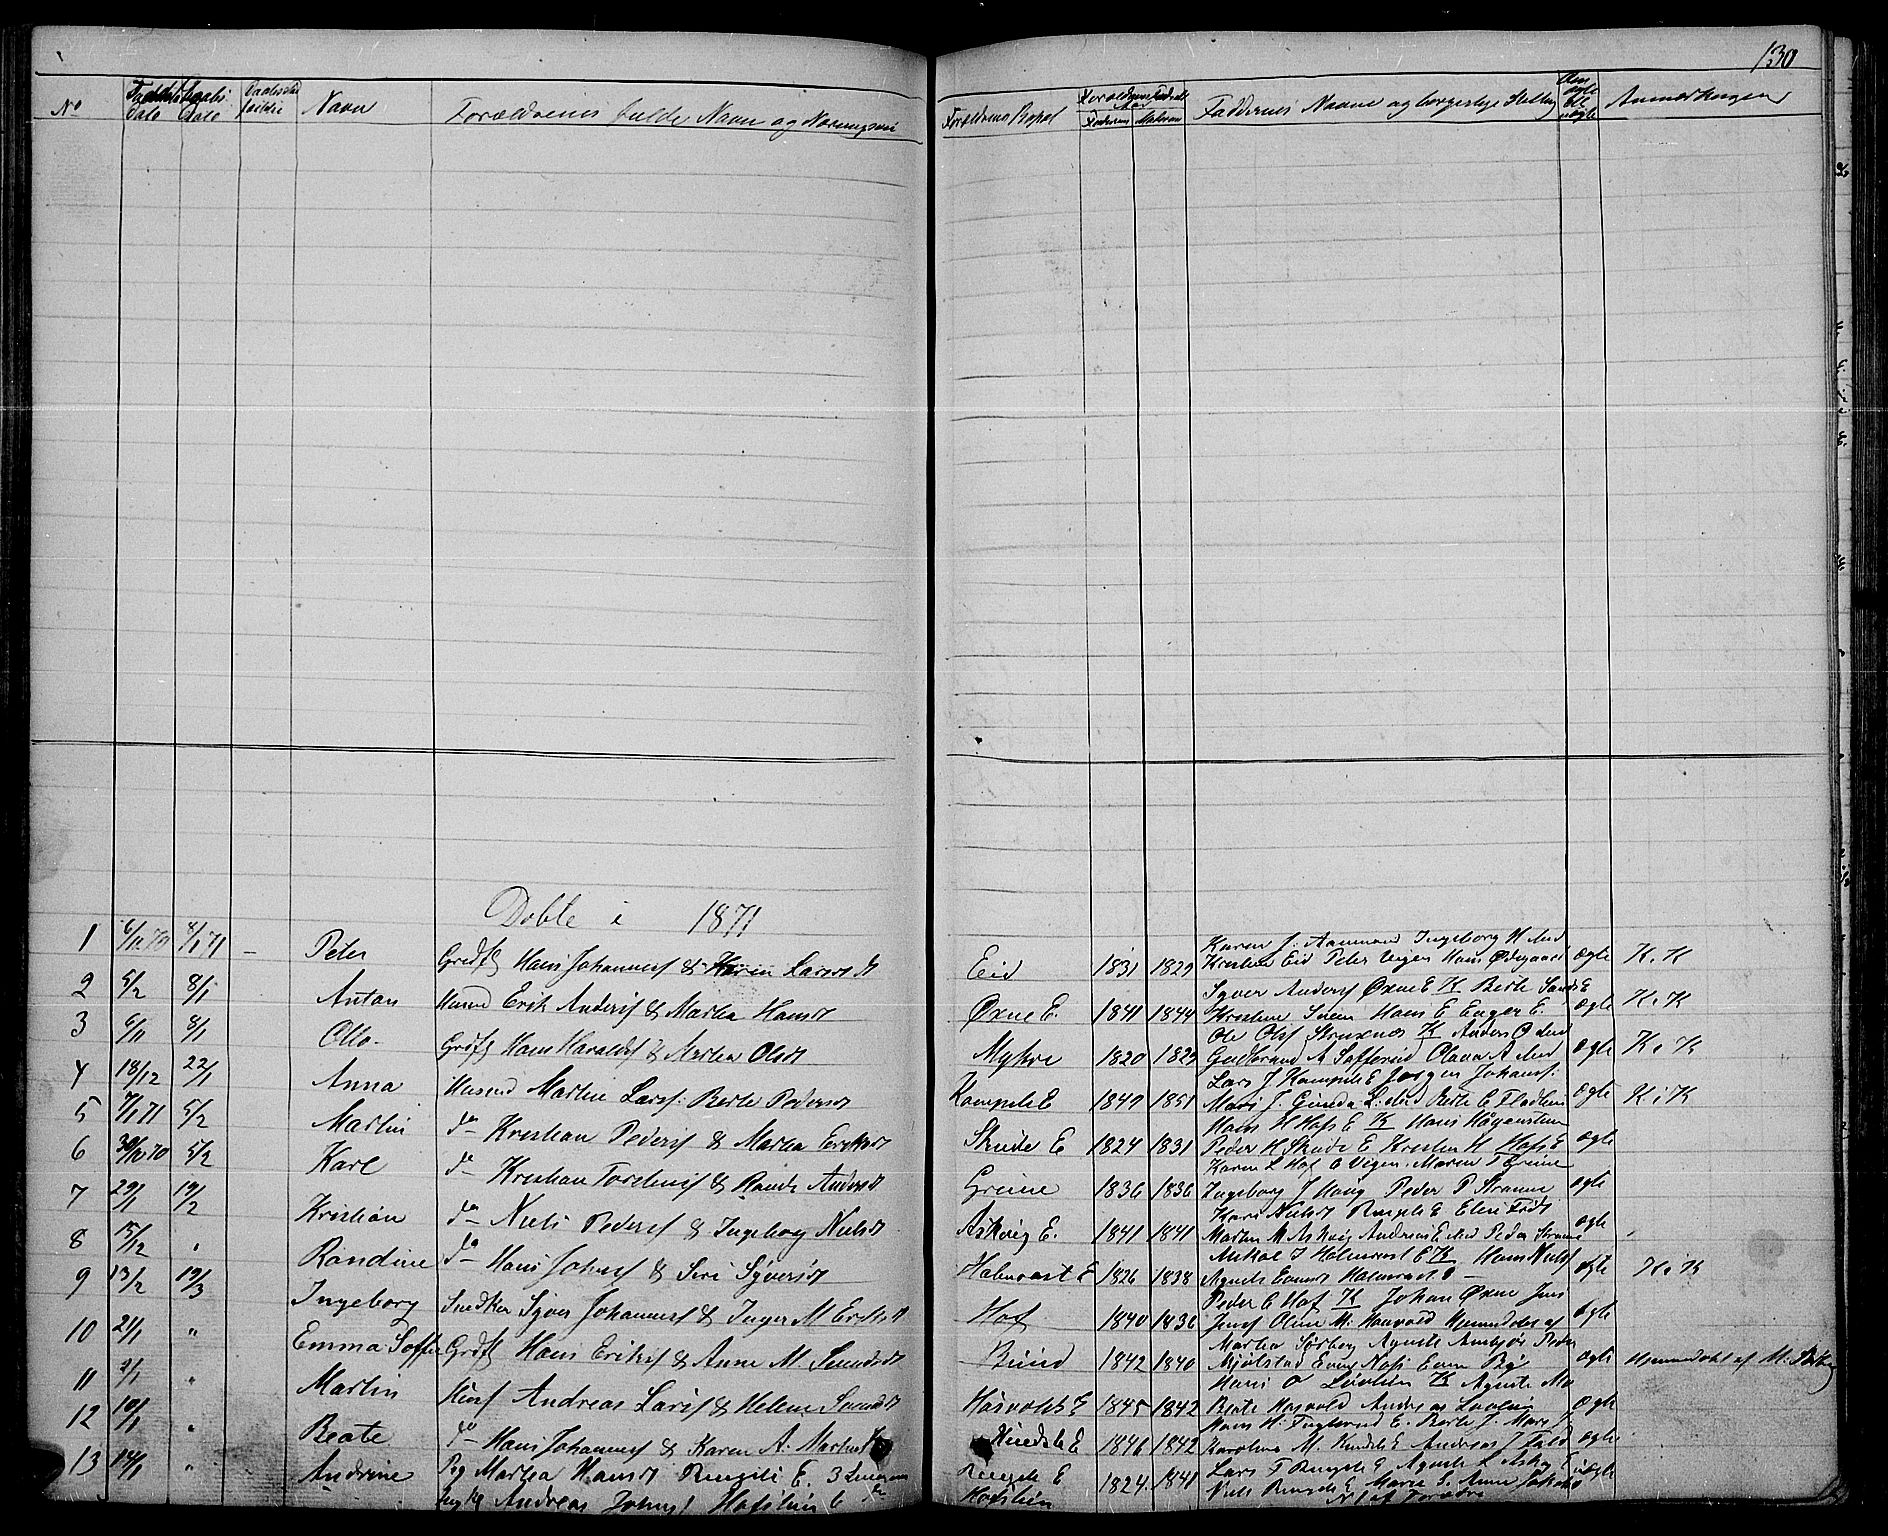 SAH, Søndre Land prestekontor, L/L0001: Klokkerbok nr. 1, 1849-1883, s. 130